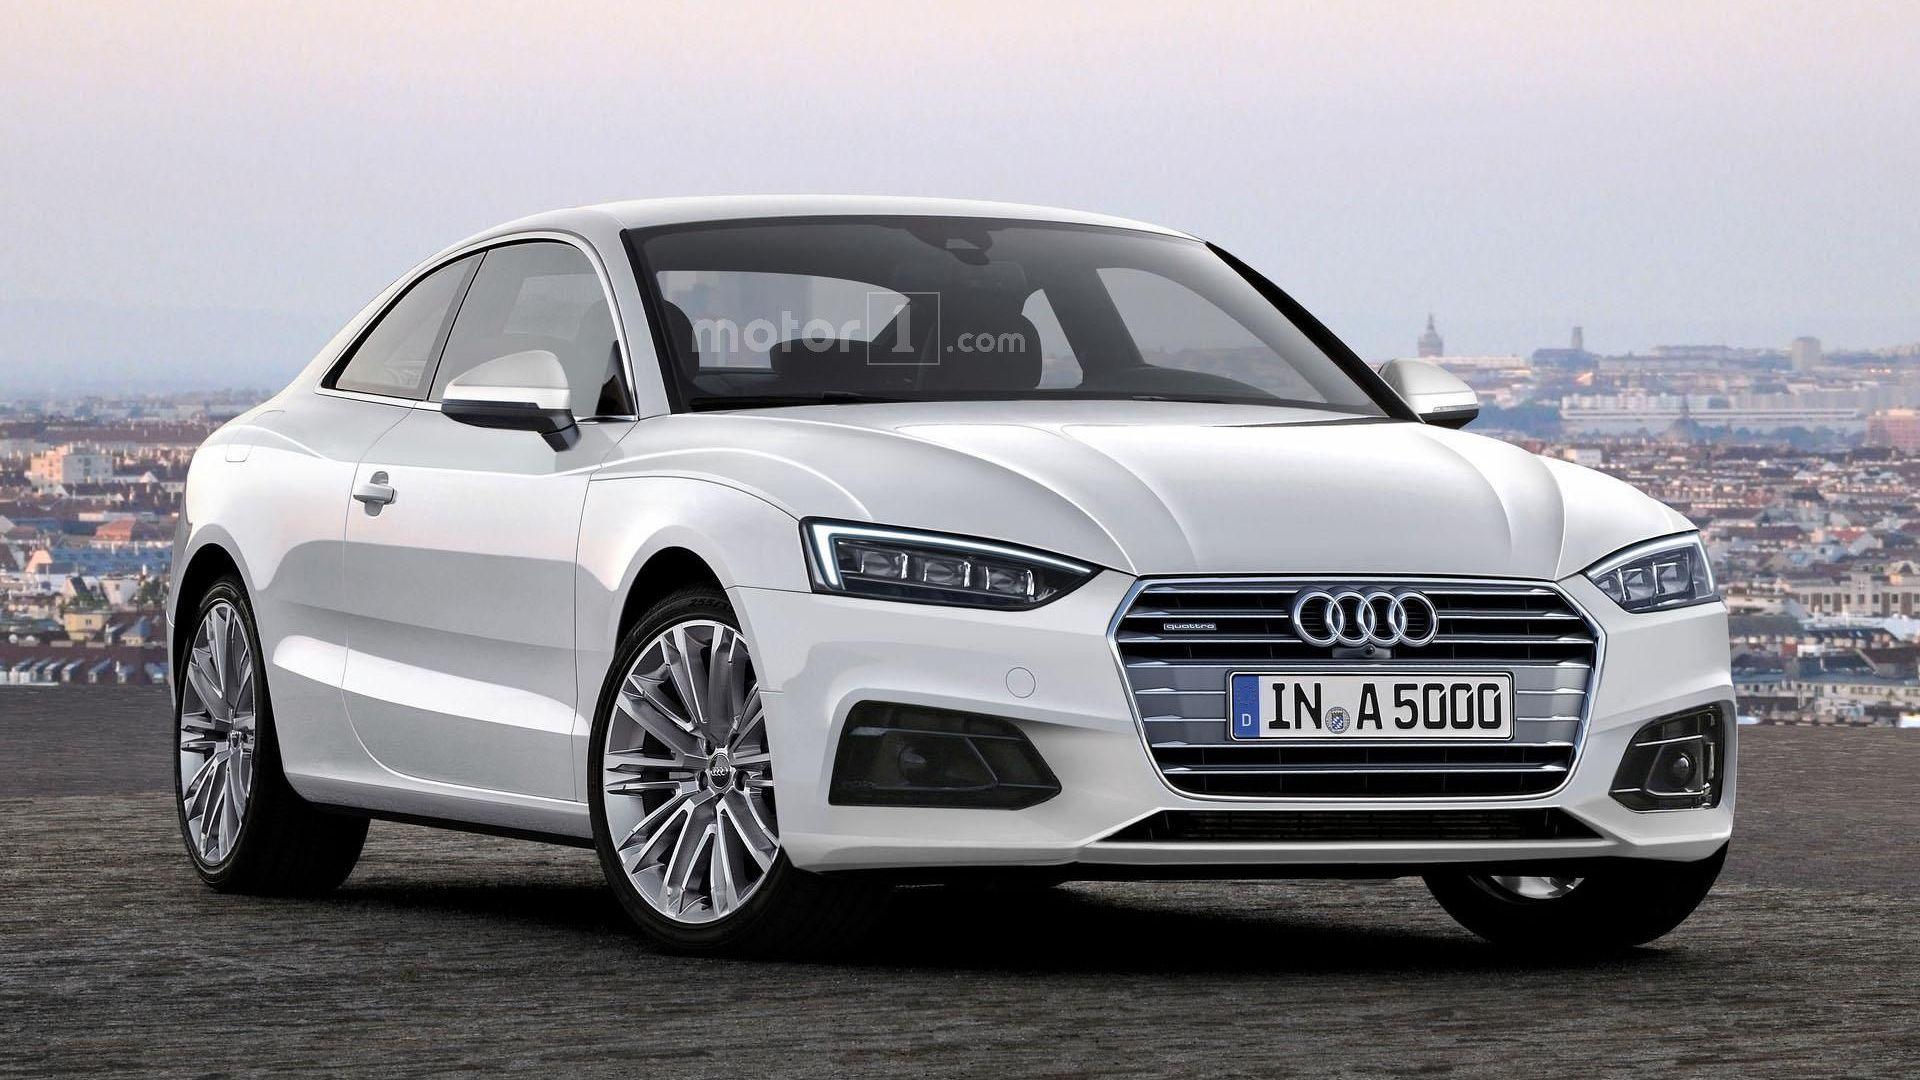 Audi A5 Sportback 20TDI SE Specs in South Africa  Carscoza